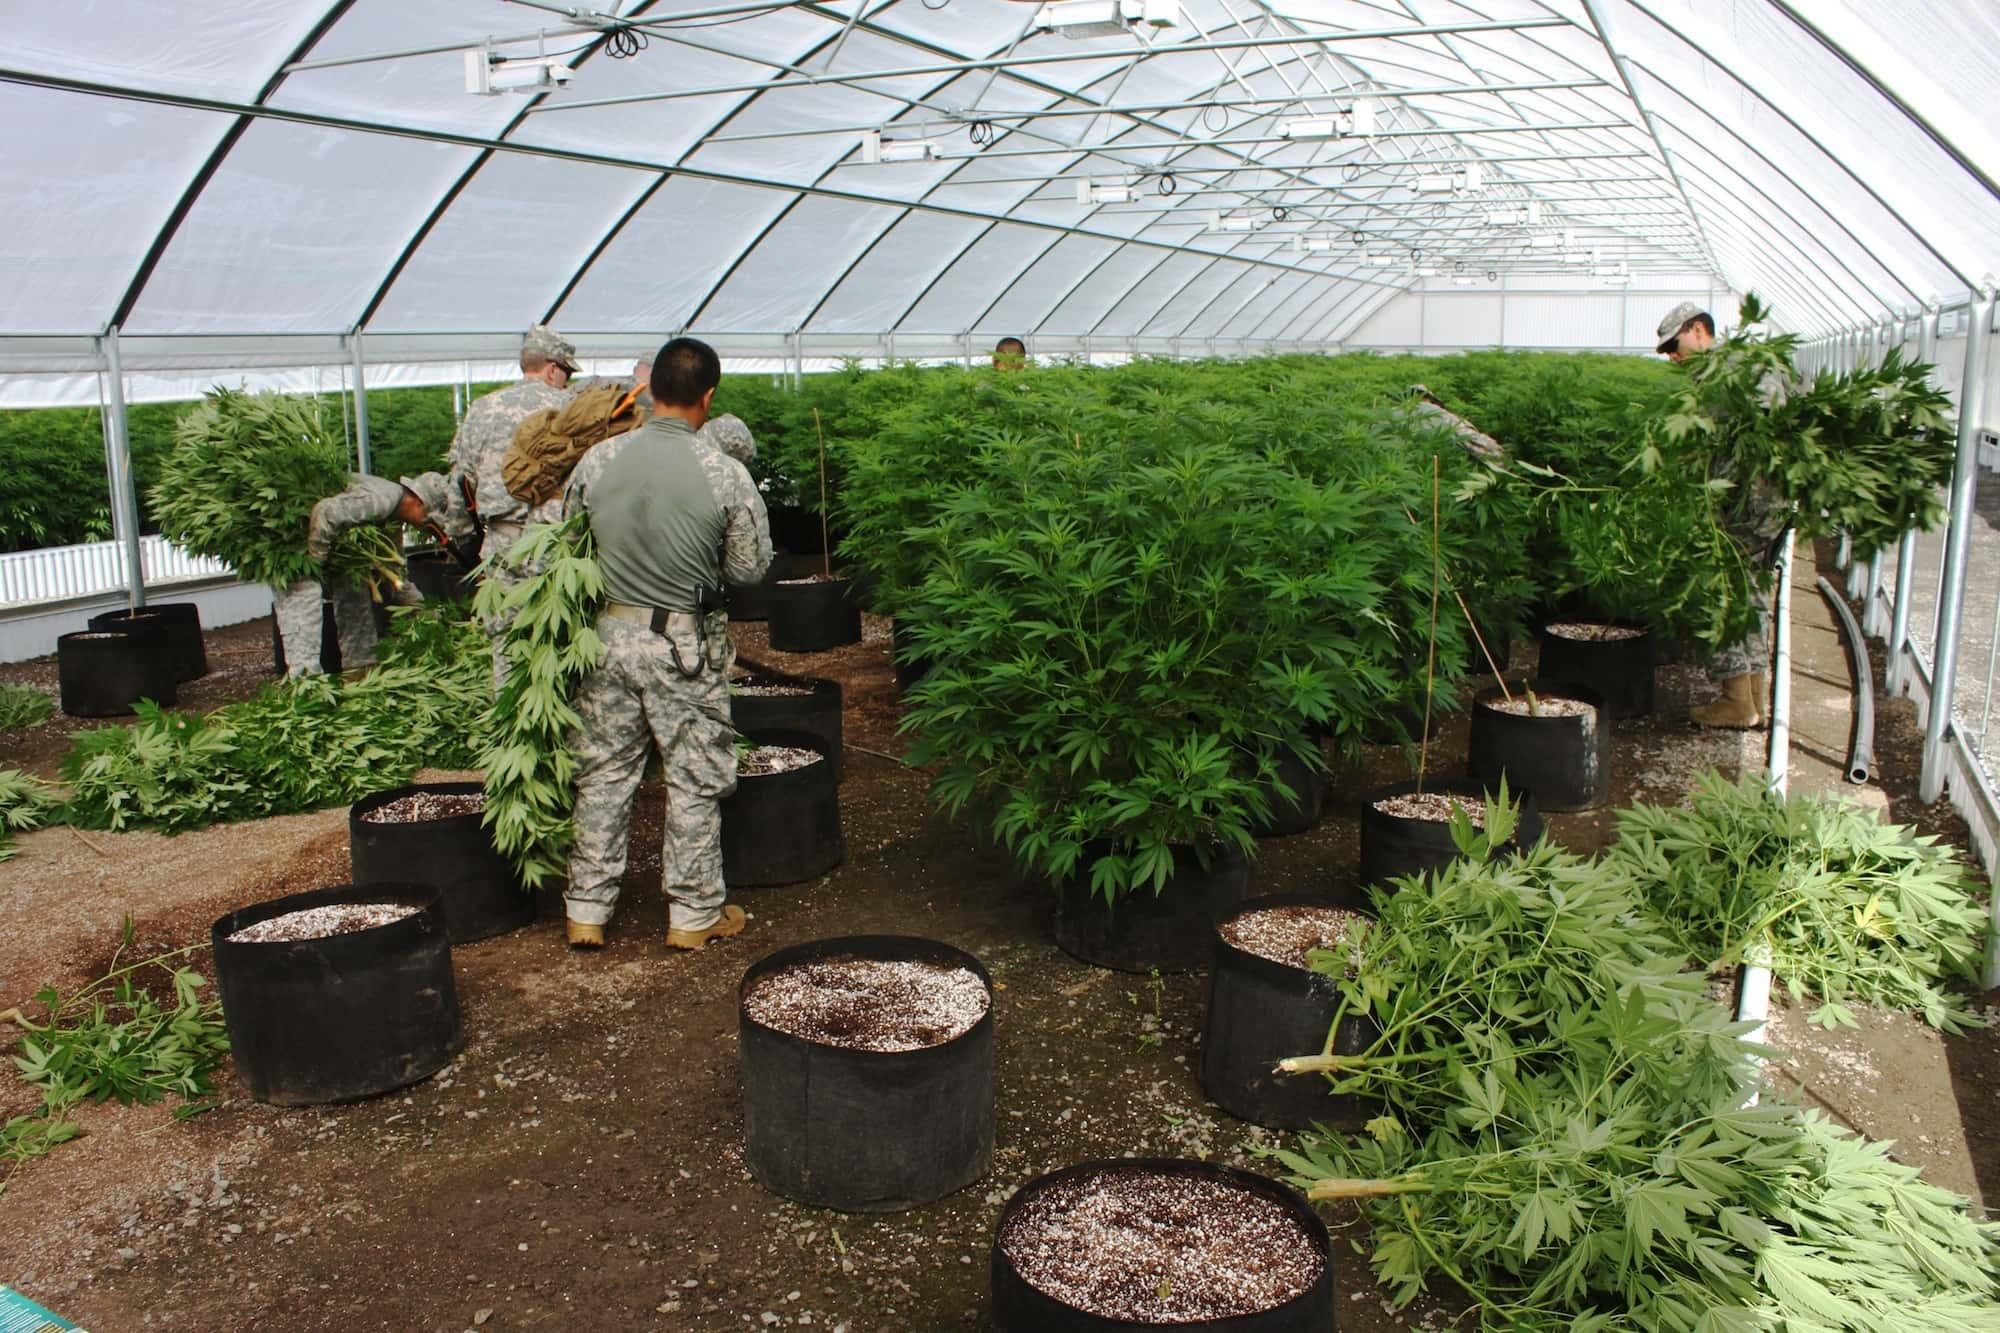 DEA Report Shows a Dramatic Drop in Cannabis Seizures in 2017